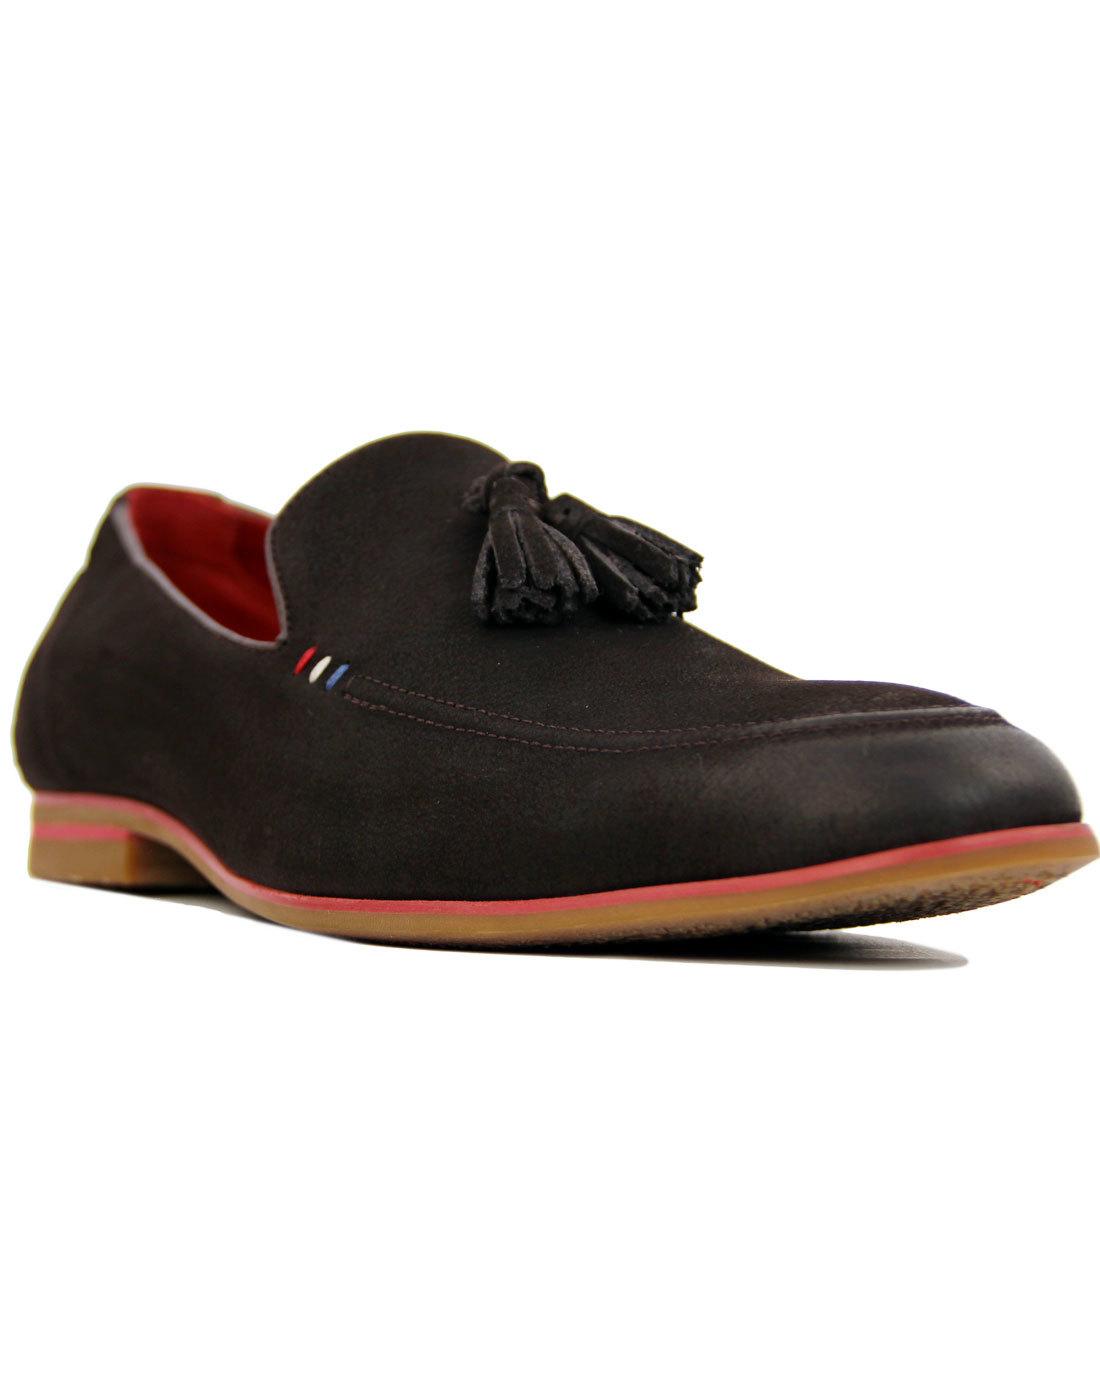 Rene SERGIO DULETTI Leather Tassel Loafers COFFEE